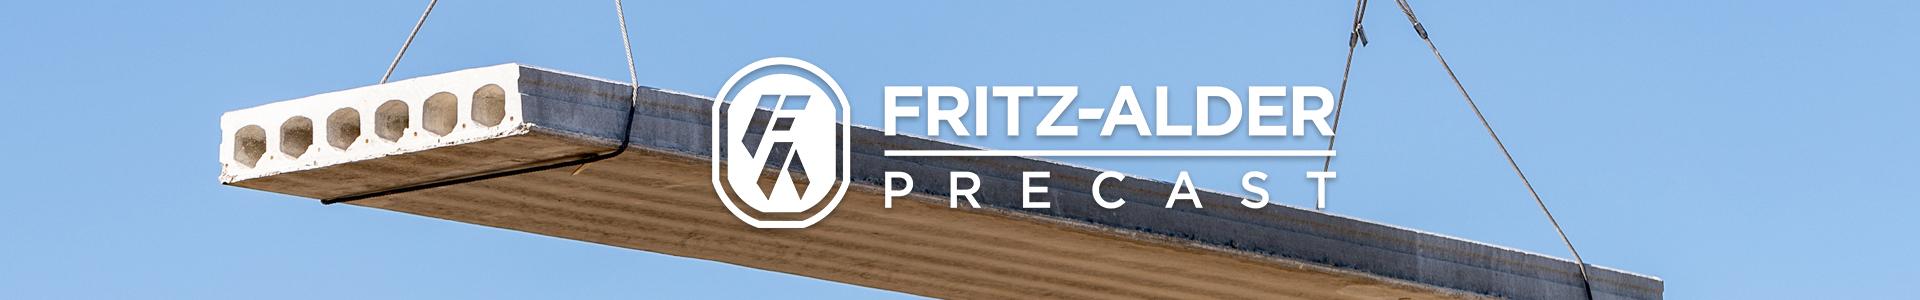 Fritz-Alder Precast